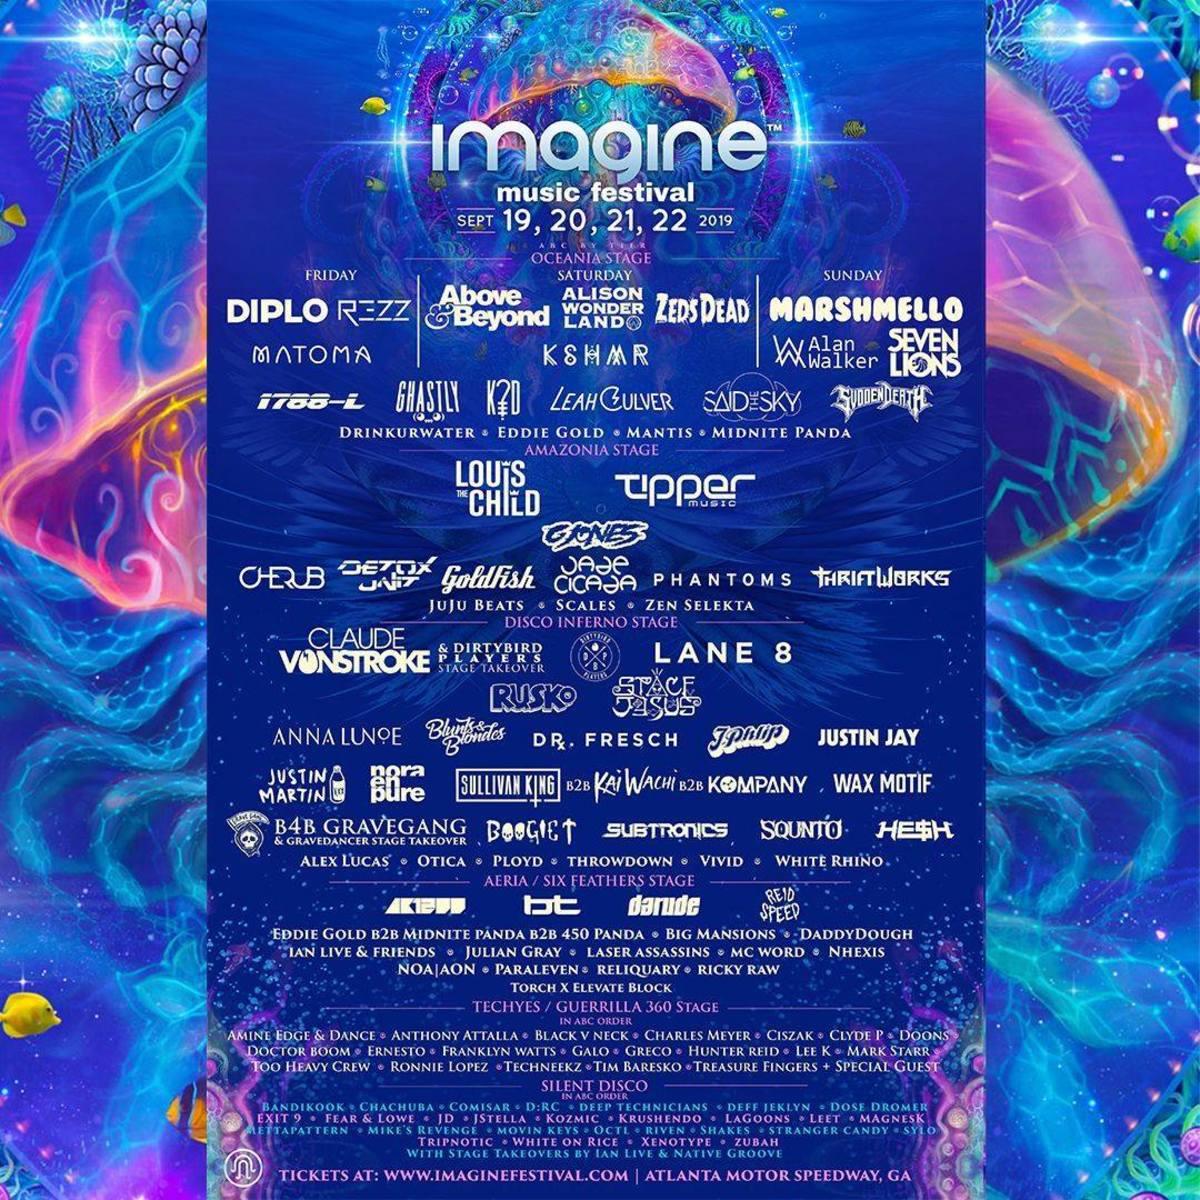 Imagine Music Festival 2019 Lineup